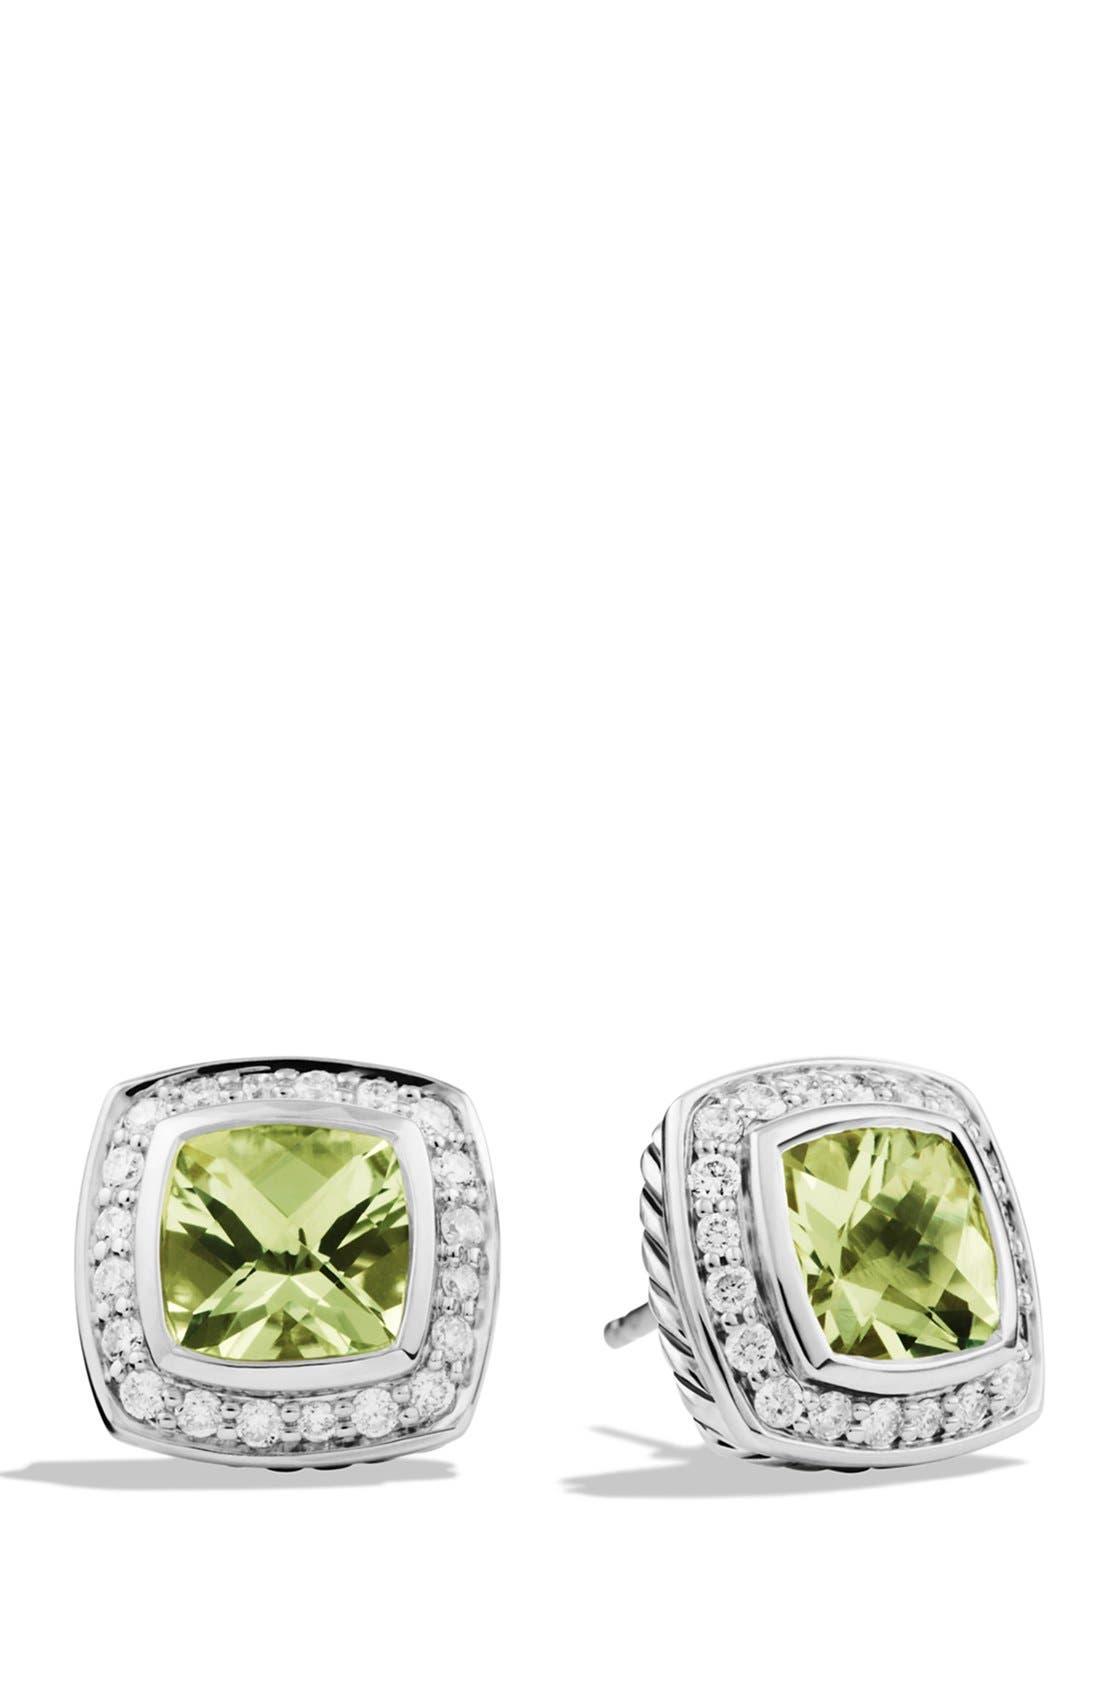 Main Image - David Yurman 'Albion' Petite Earrings with Semiprecious Stones & Diamonds